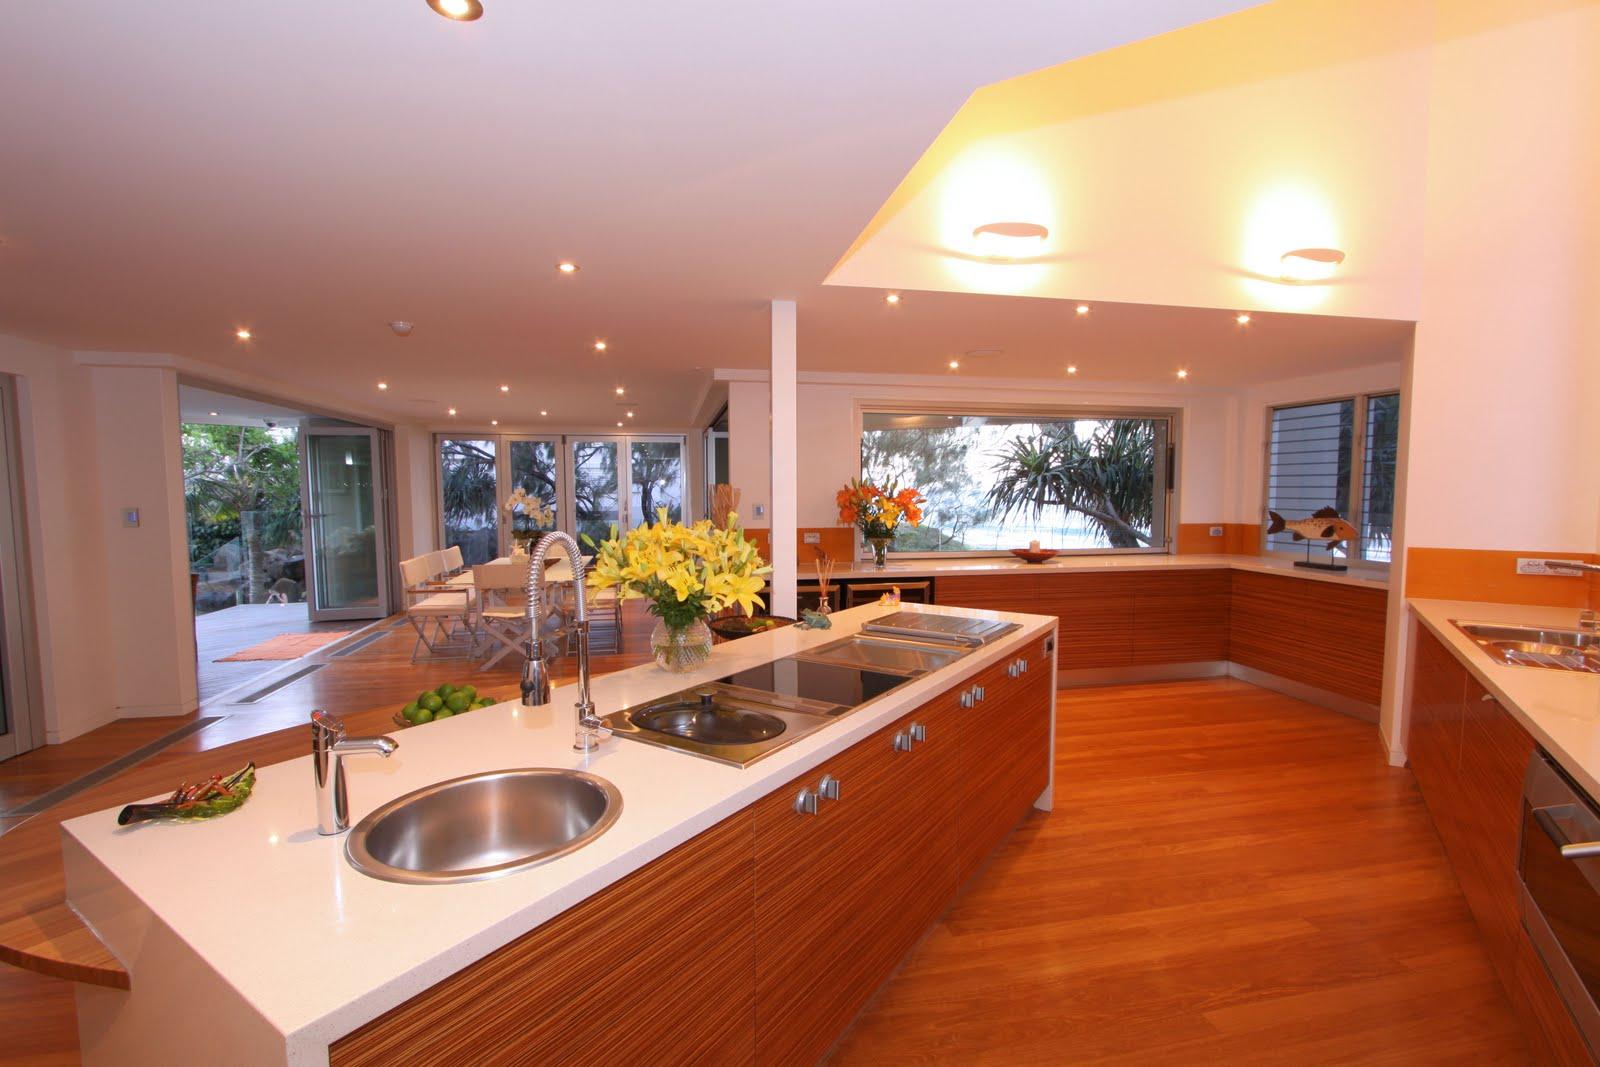 Sbt Designs Qmba Award Winning House